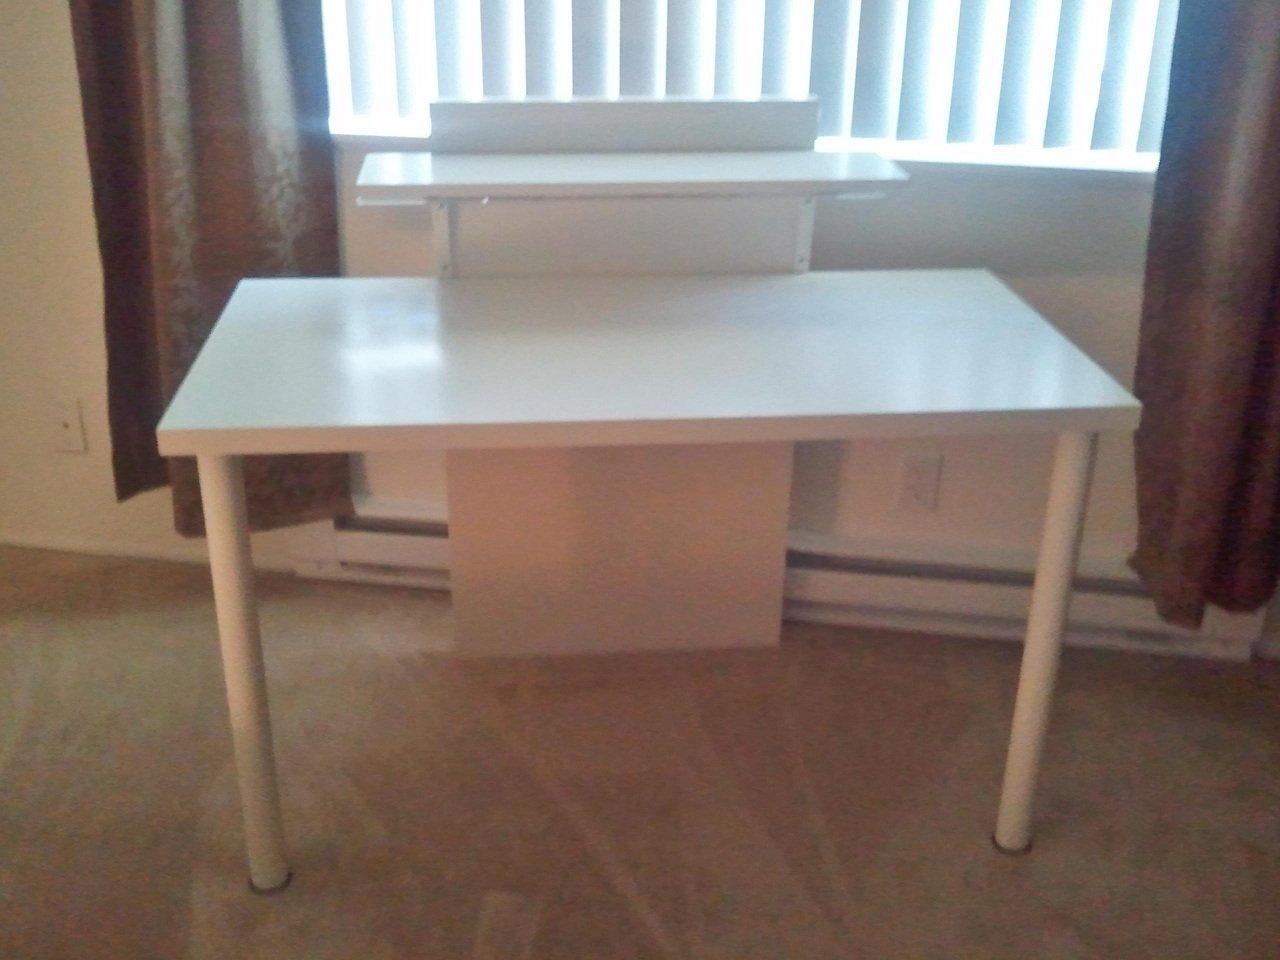 Ikea Table Top Legs لم يسبق له مثيل